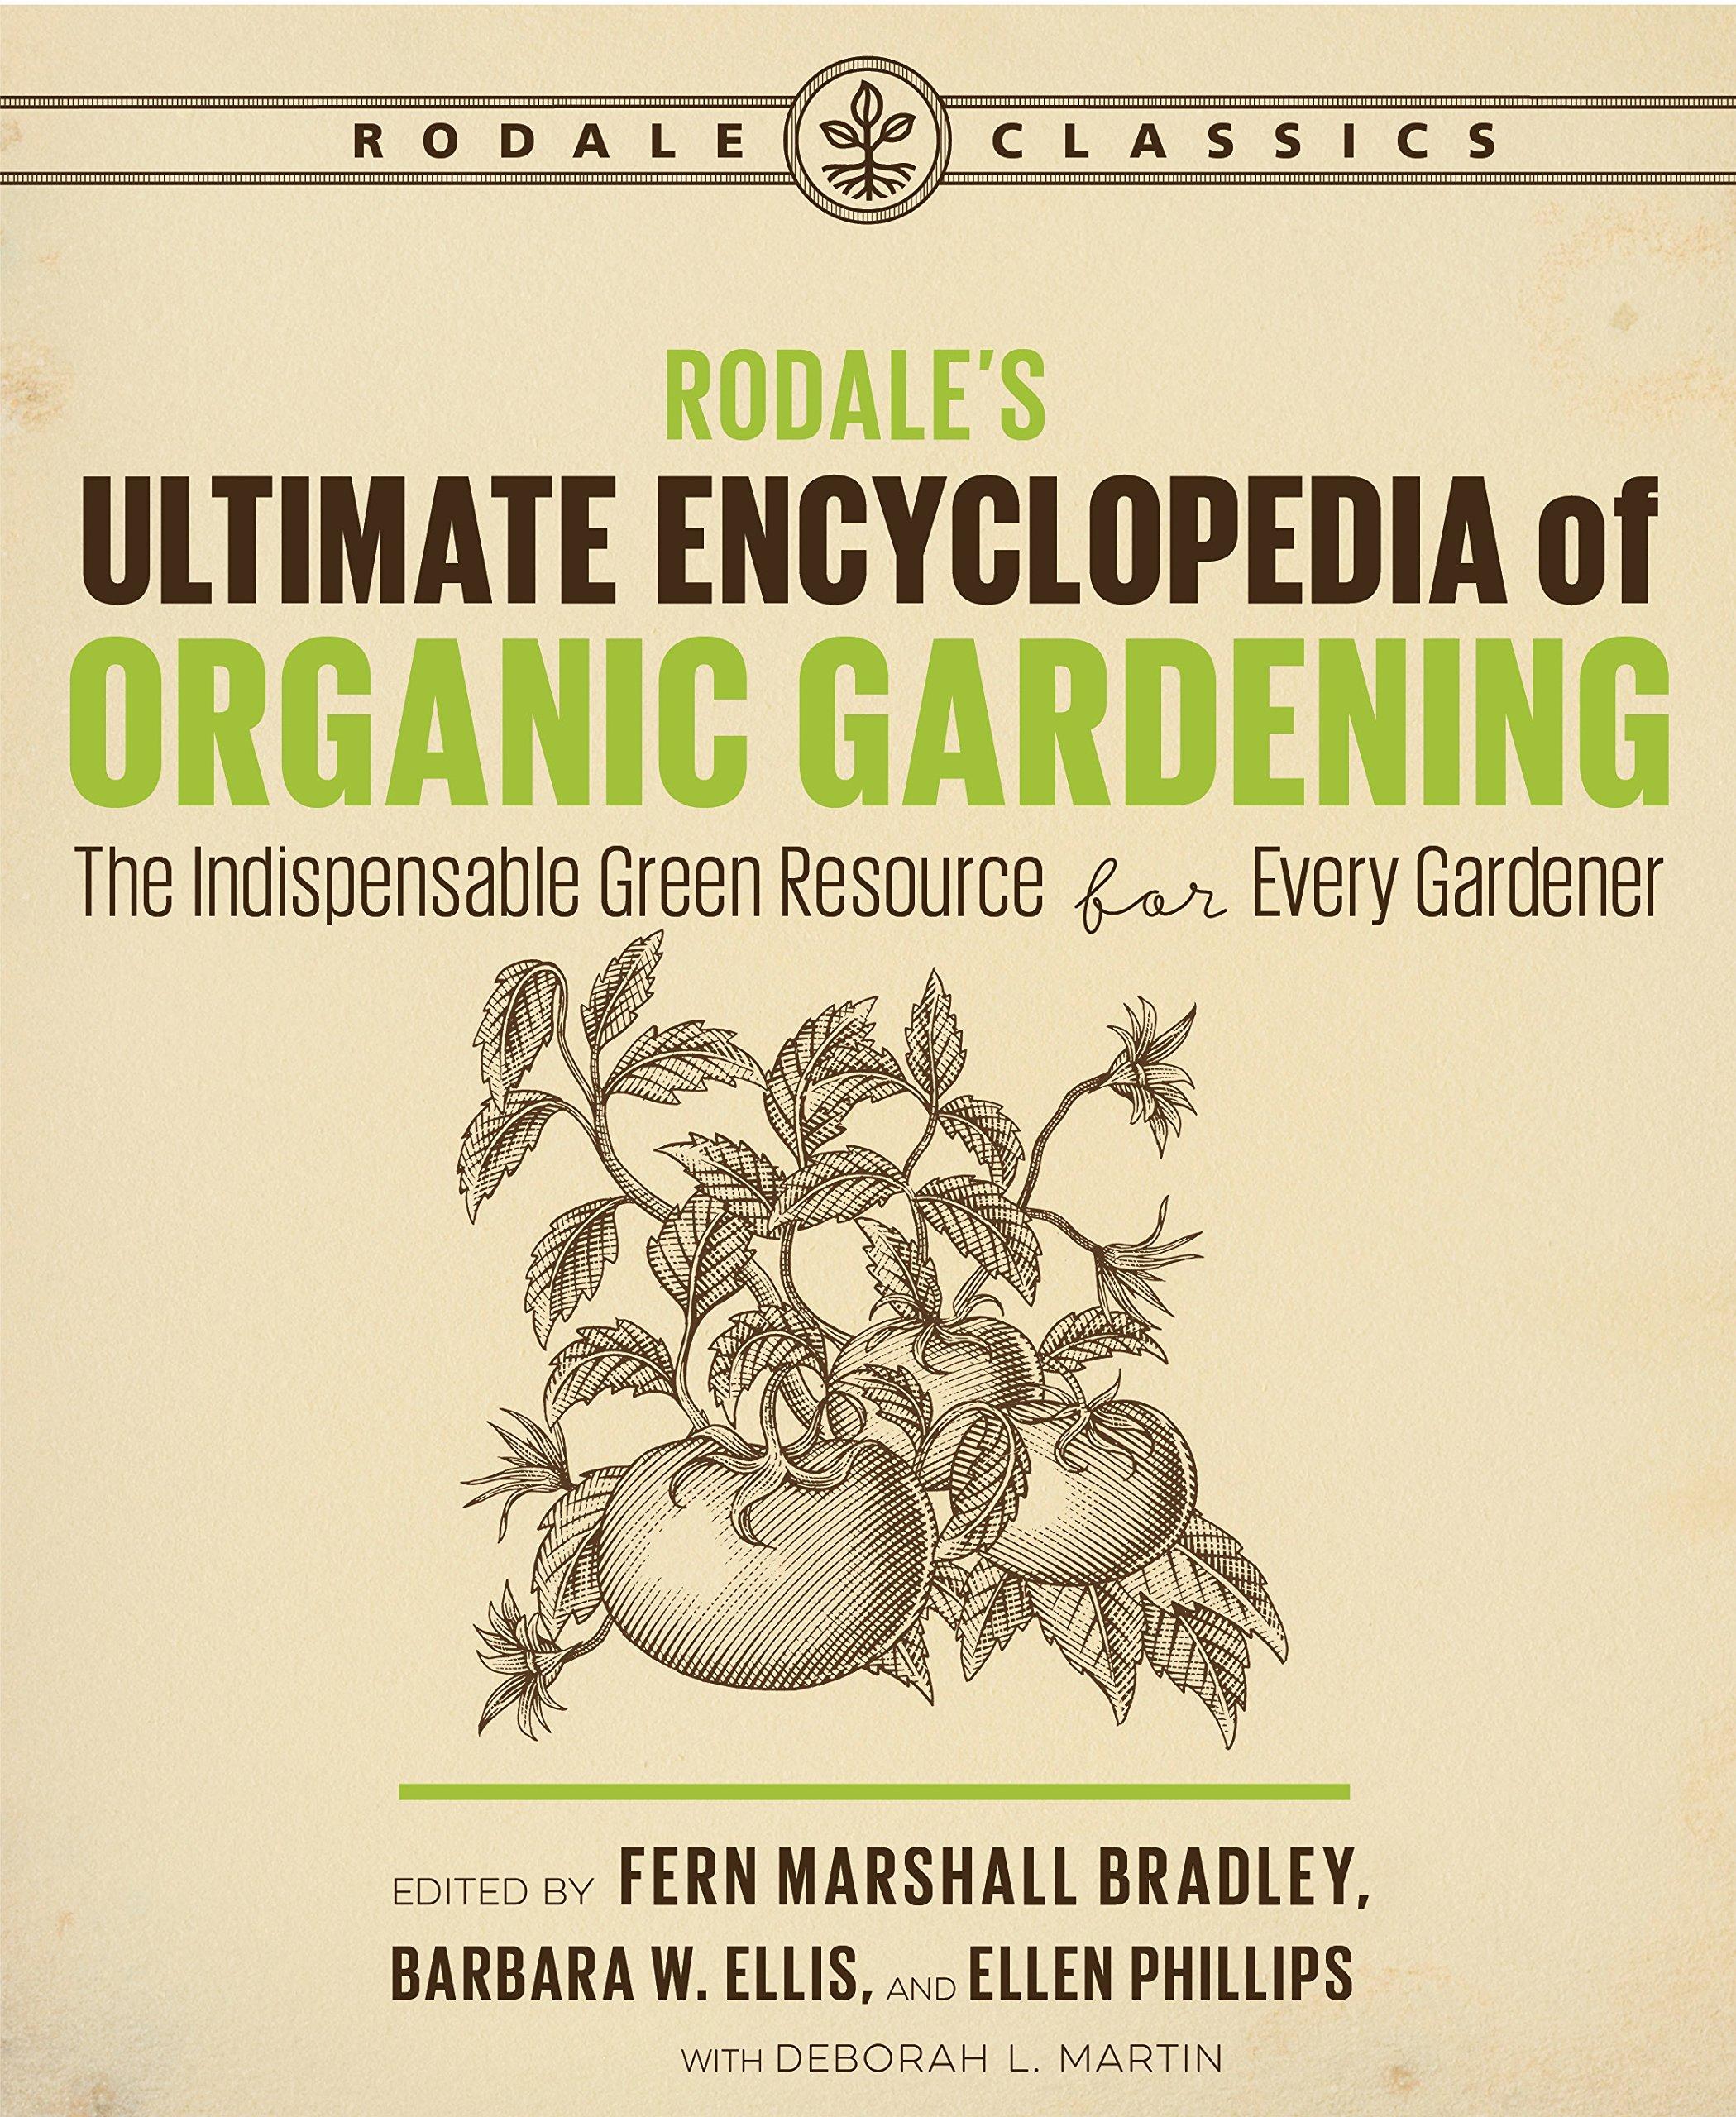 Rodales Ultimate Encyclopedia Organic Gardening product image